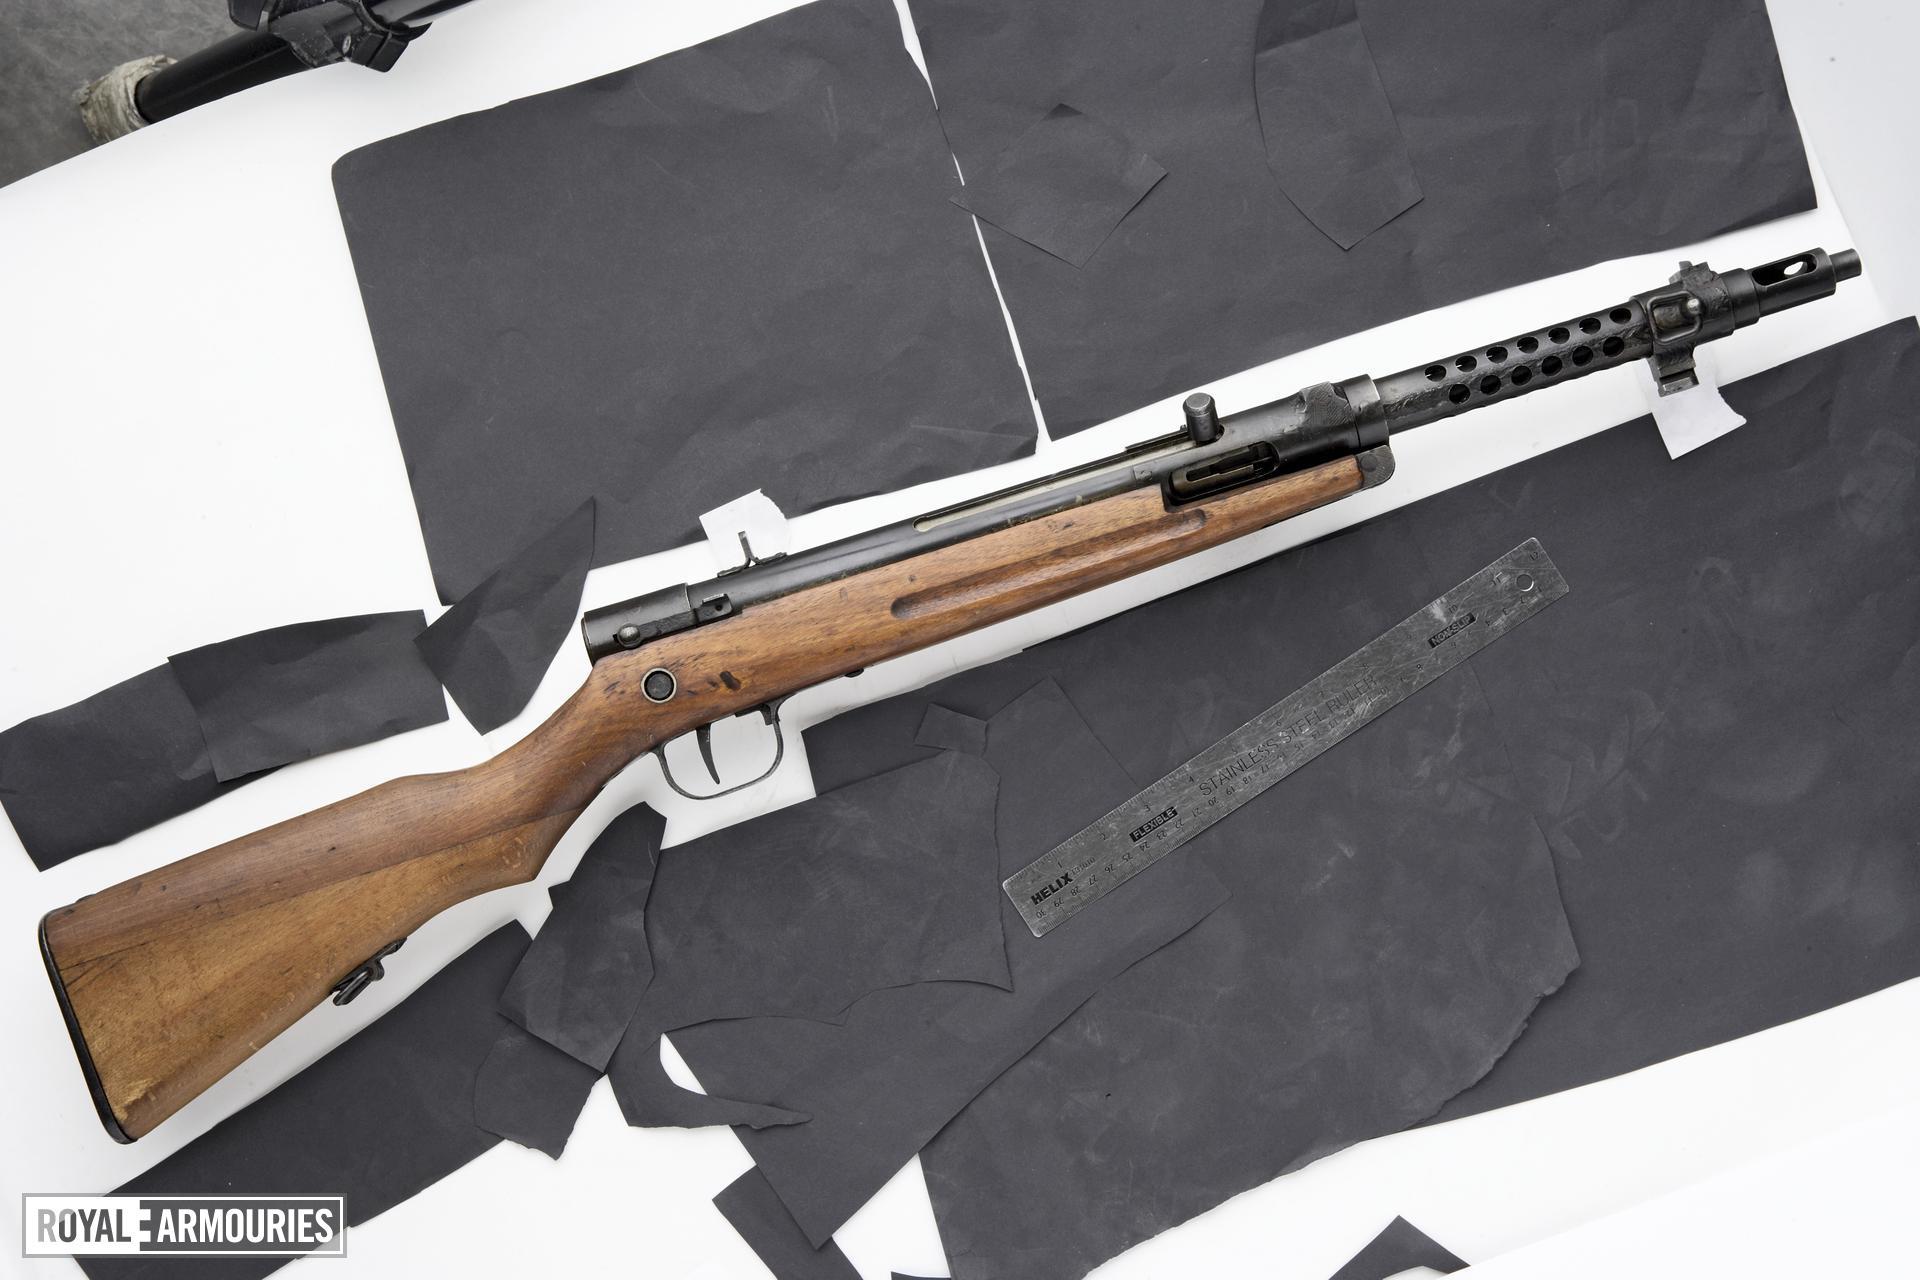 Centrefire automatic submachine gun - Type 100